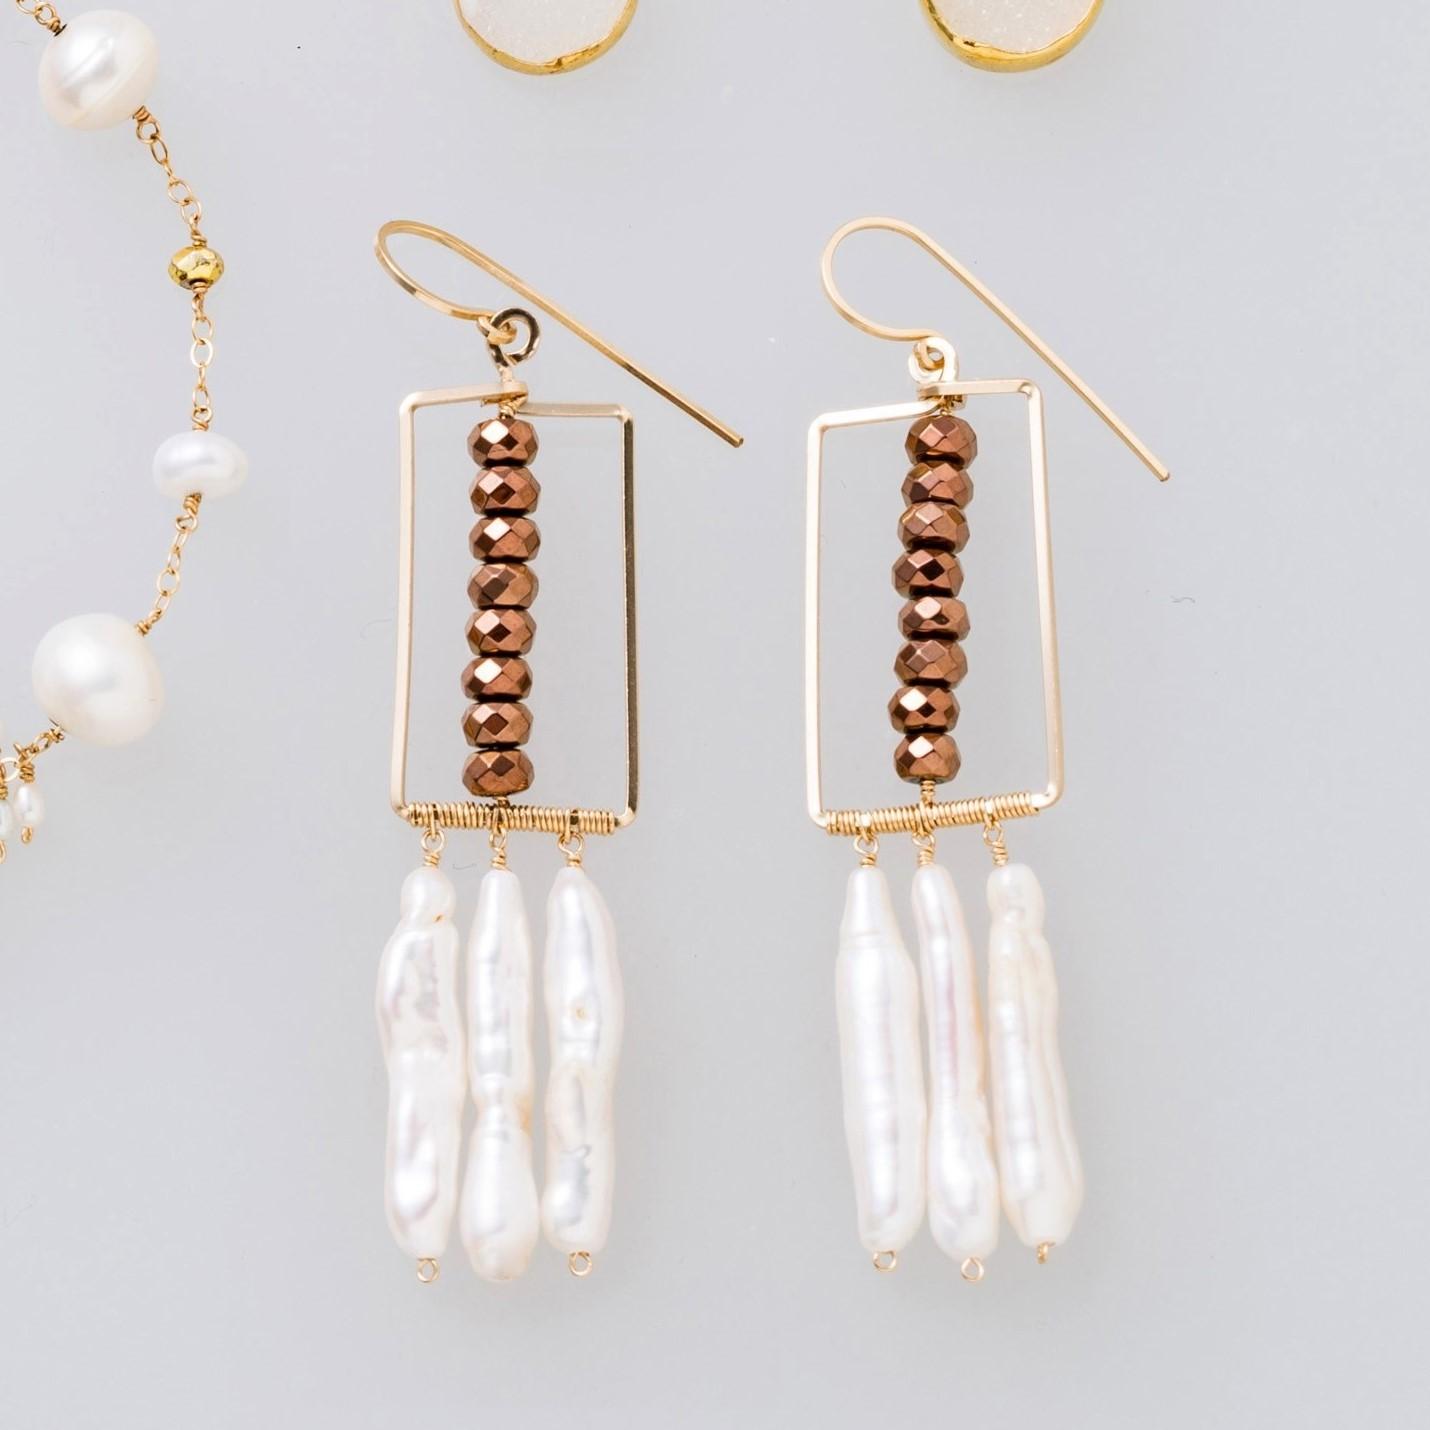 雑誌掲載[装苑]1月号14kgf*Freshwater Pearl fringe pierced earring / earring 送料無料